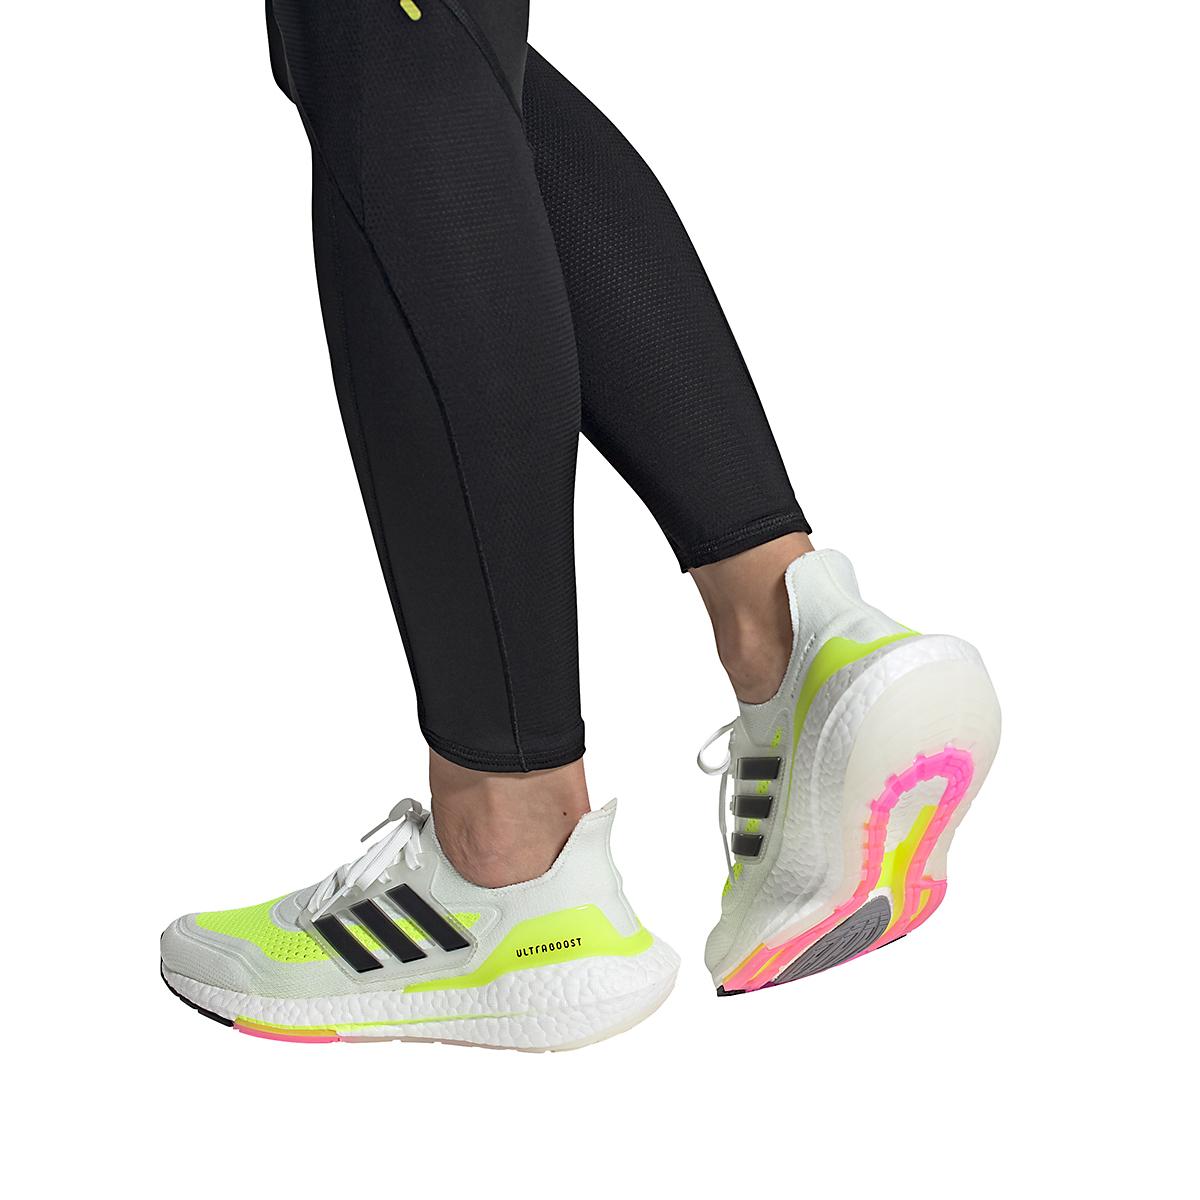 Women's Adidas Ultraboost 21 Running Shoe - Color: Cloud White/Black/Solar Yellow - Size: 5 - Width: Regular, Cloud White/Black/Solar Yellow, large, image 7